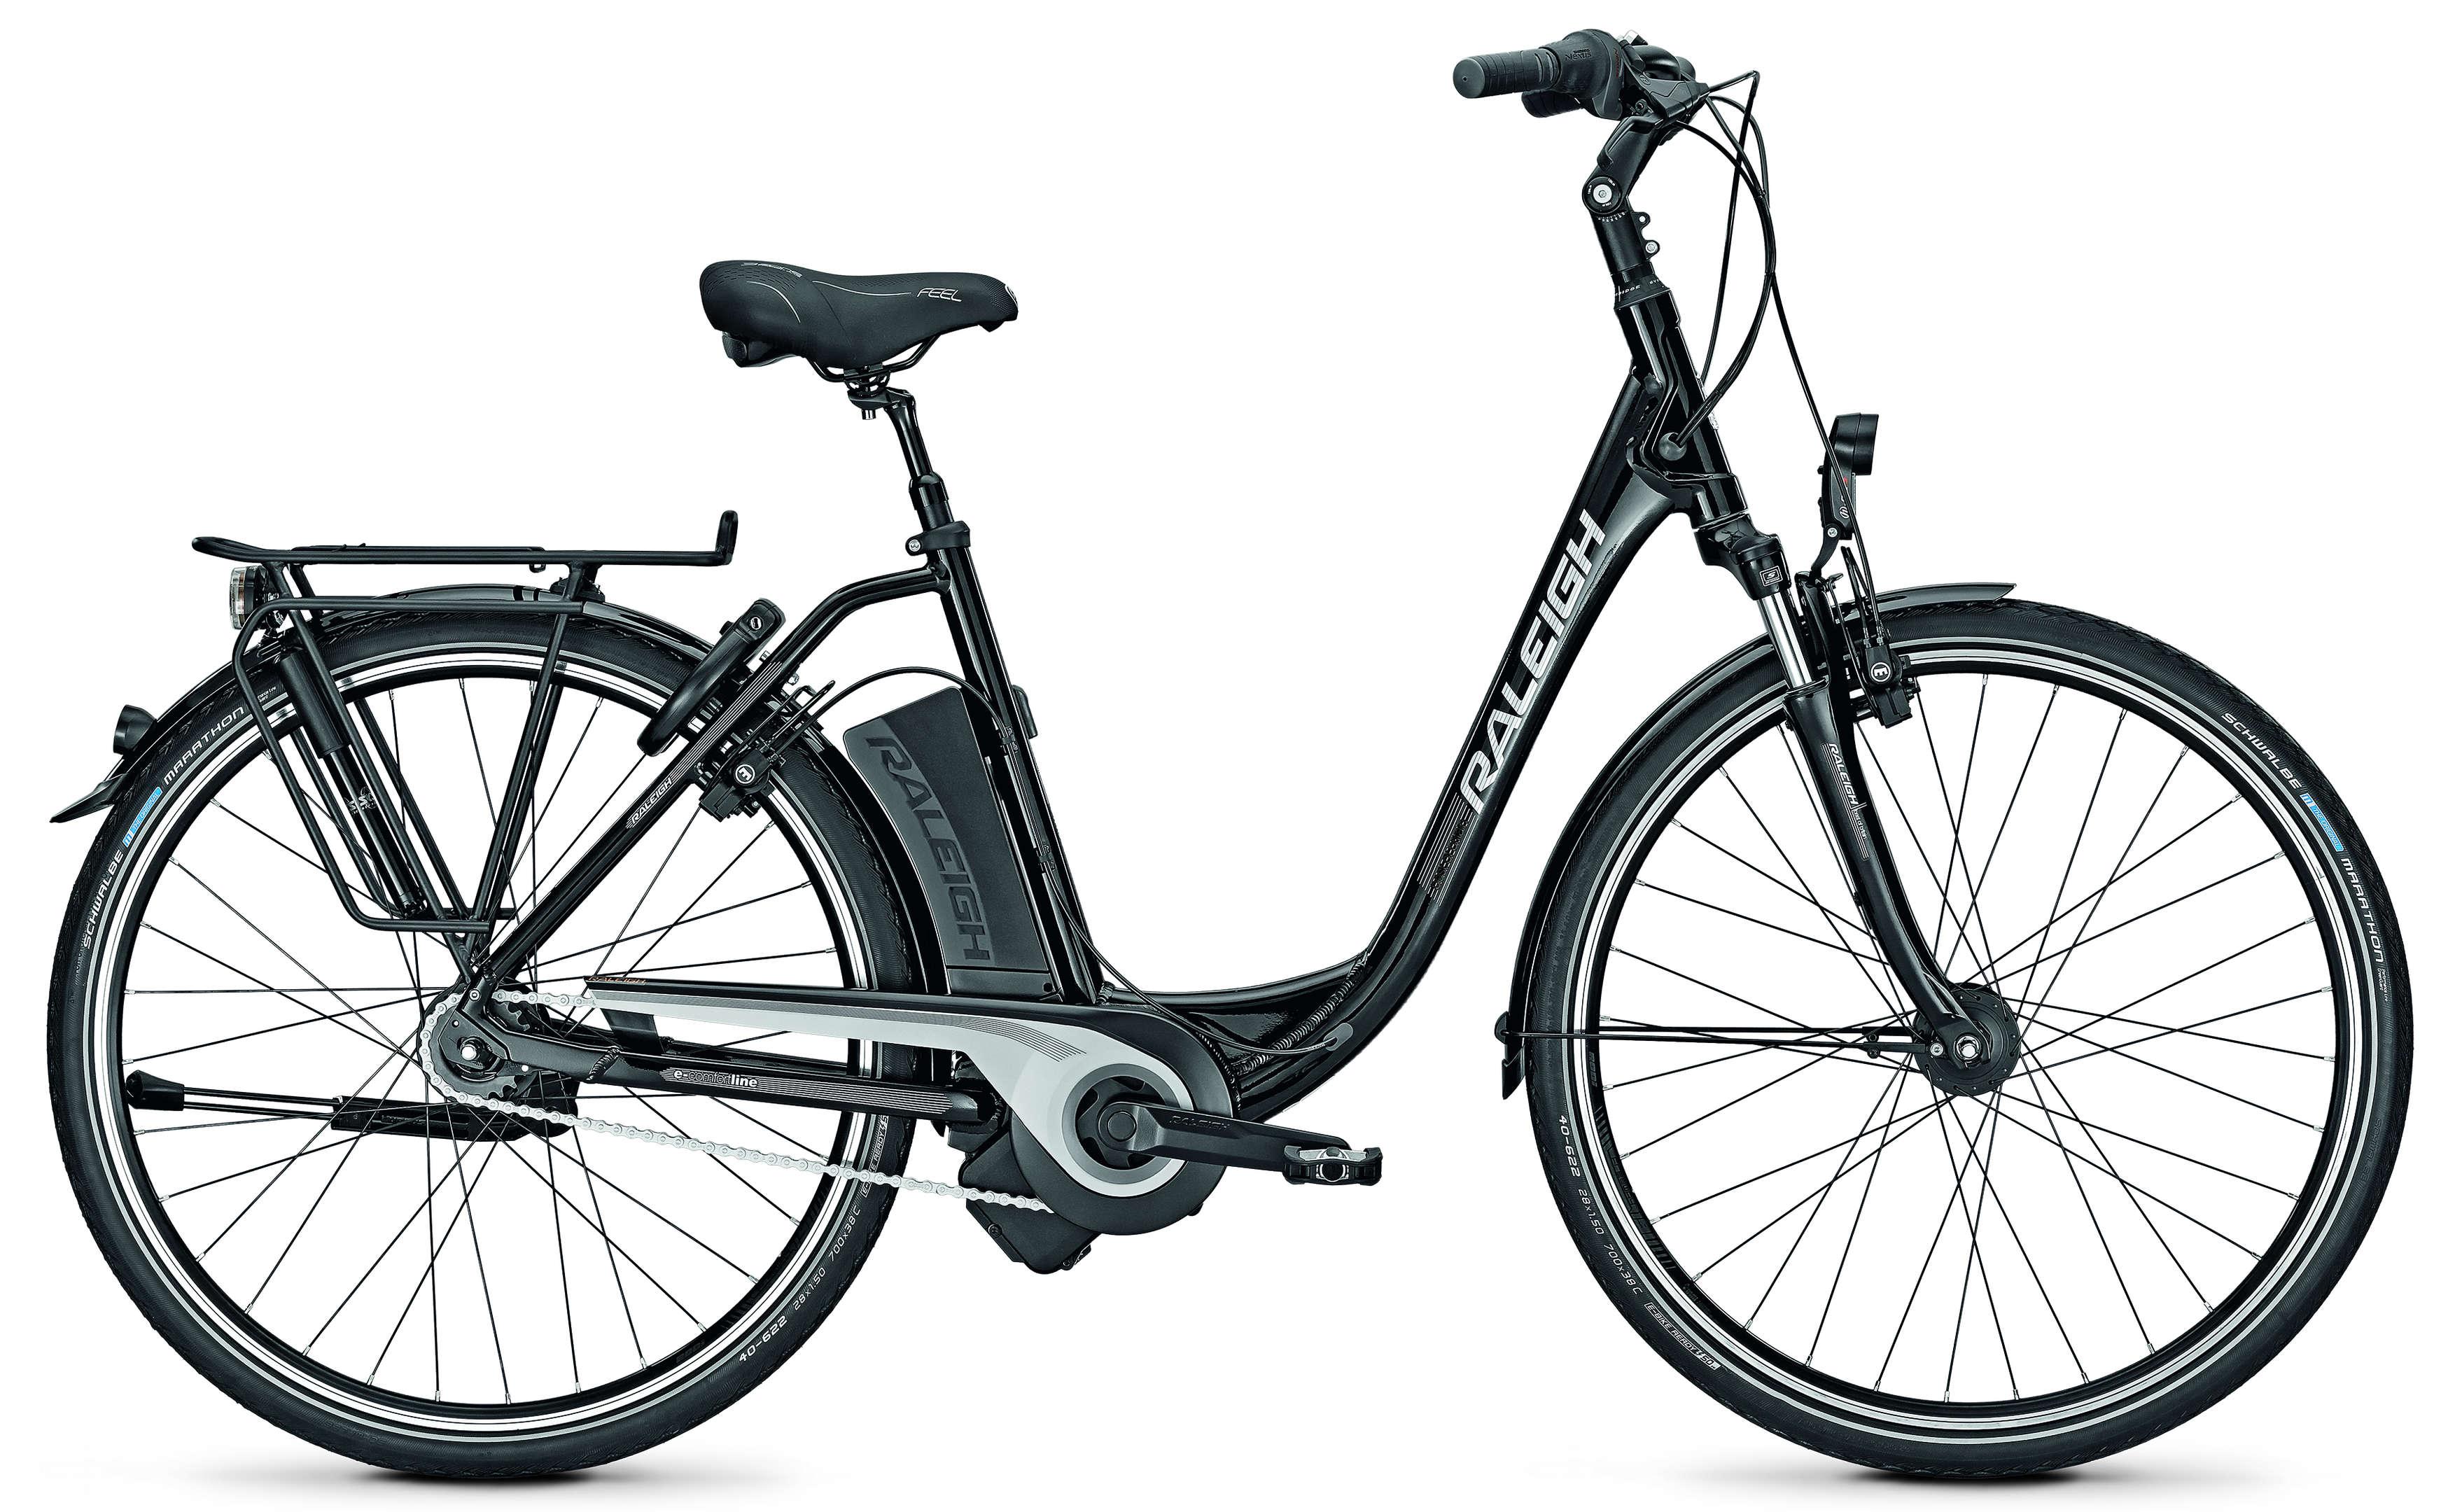 raleigh e bike dover impulse 8r hs hercules bike leasing powered by euroradhercules bike. Black Bedroom Furniture Sets. Home Design Ideas